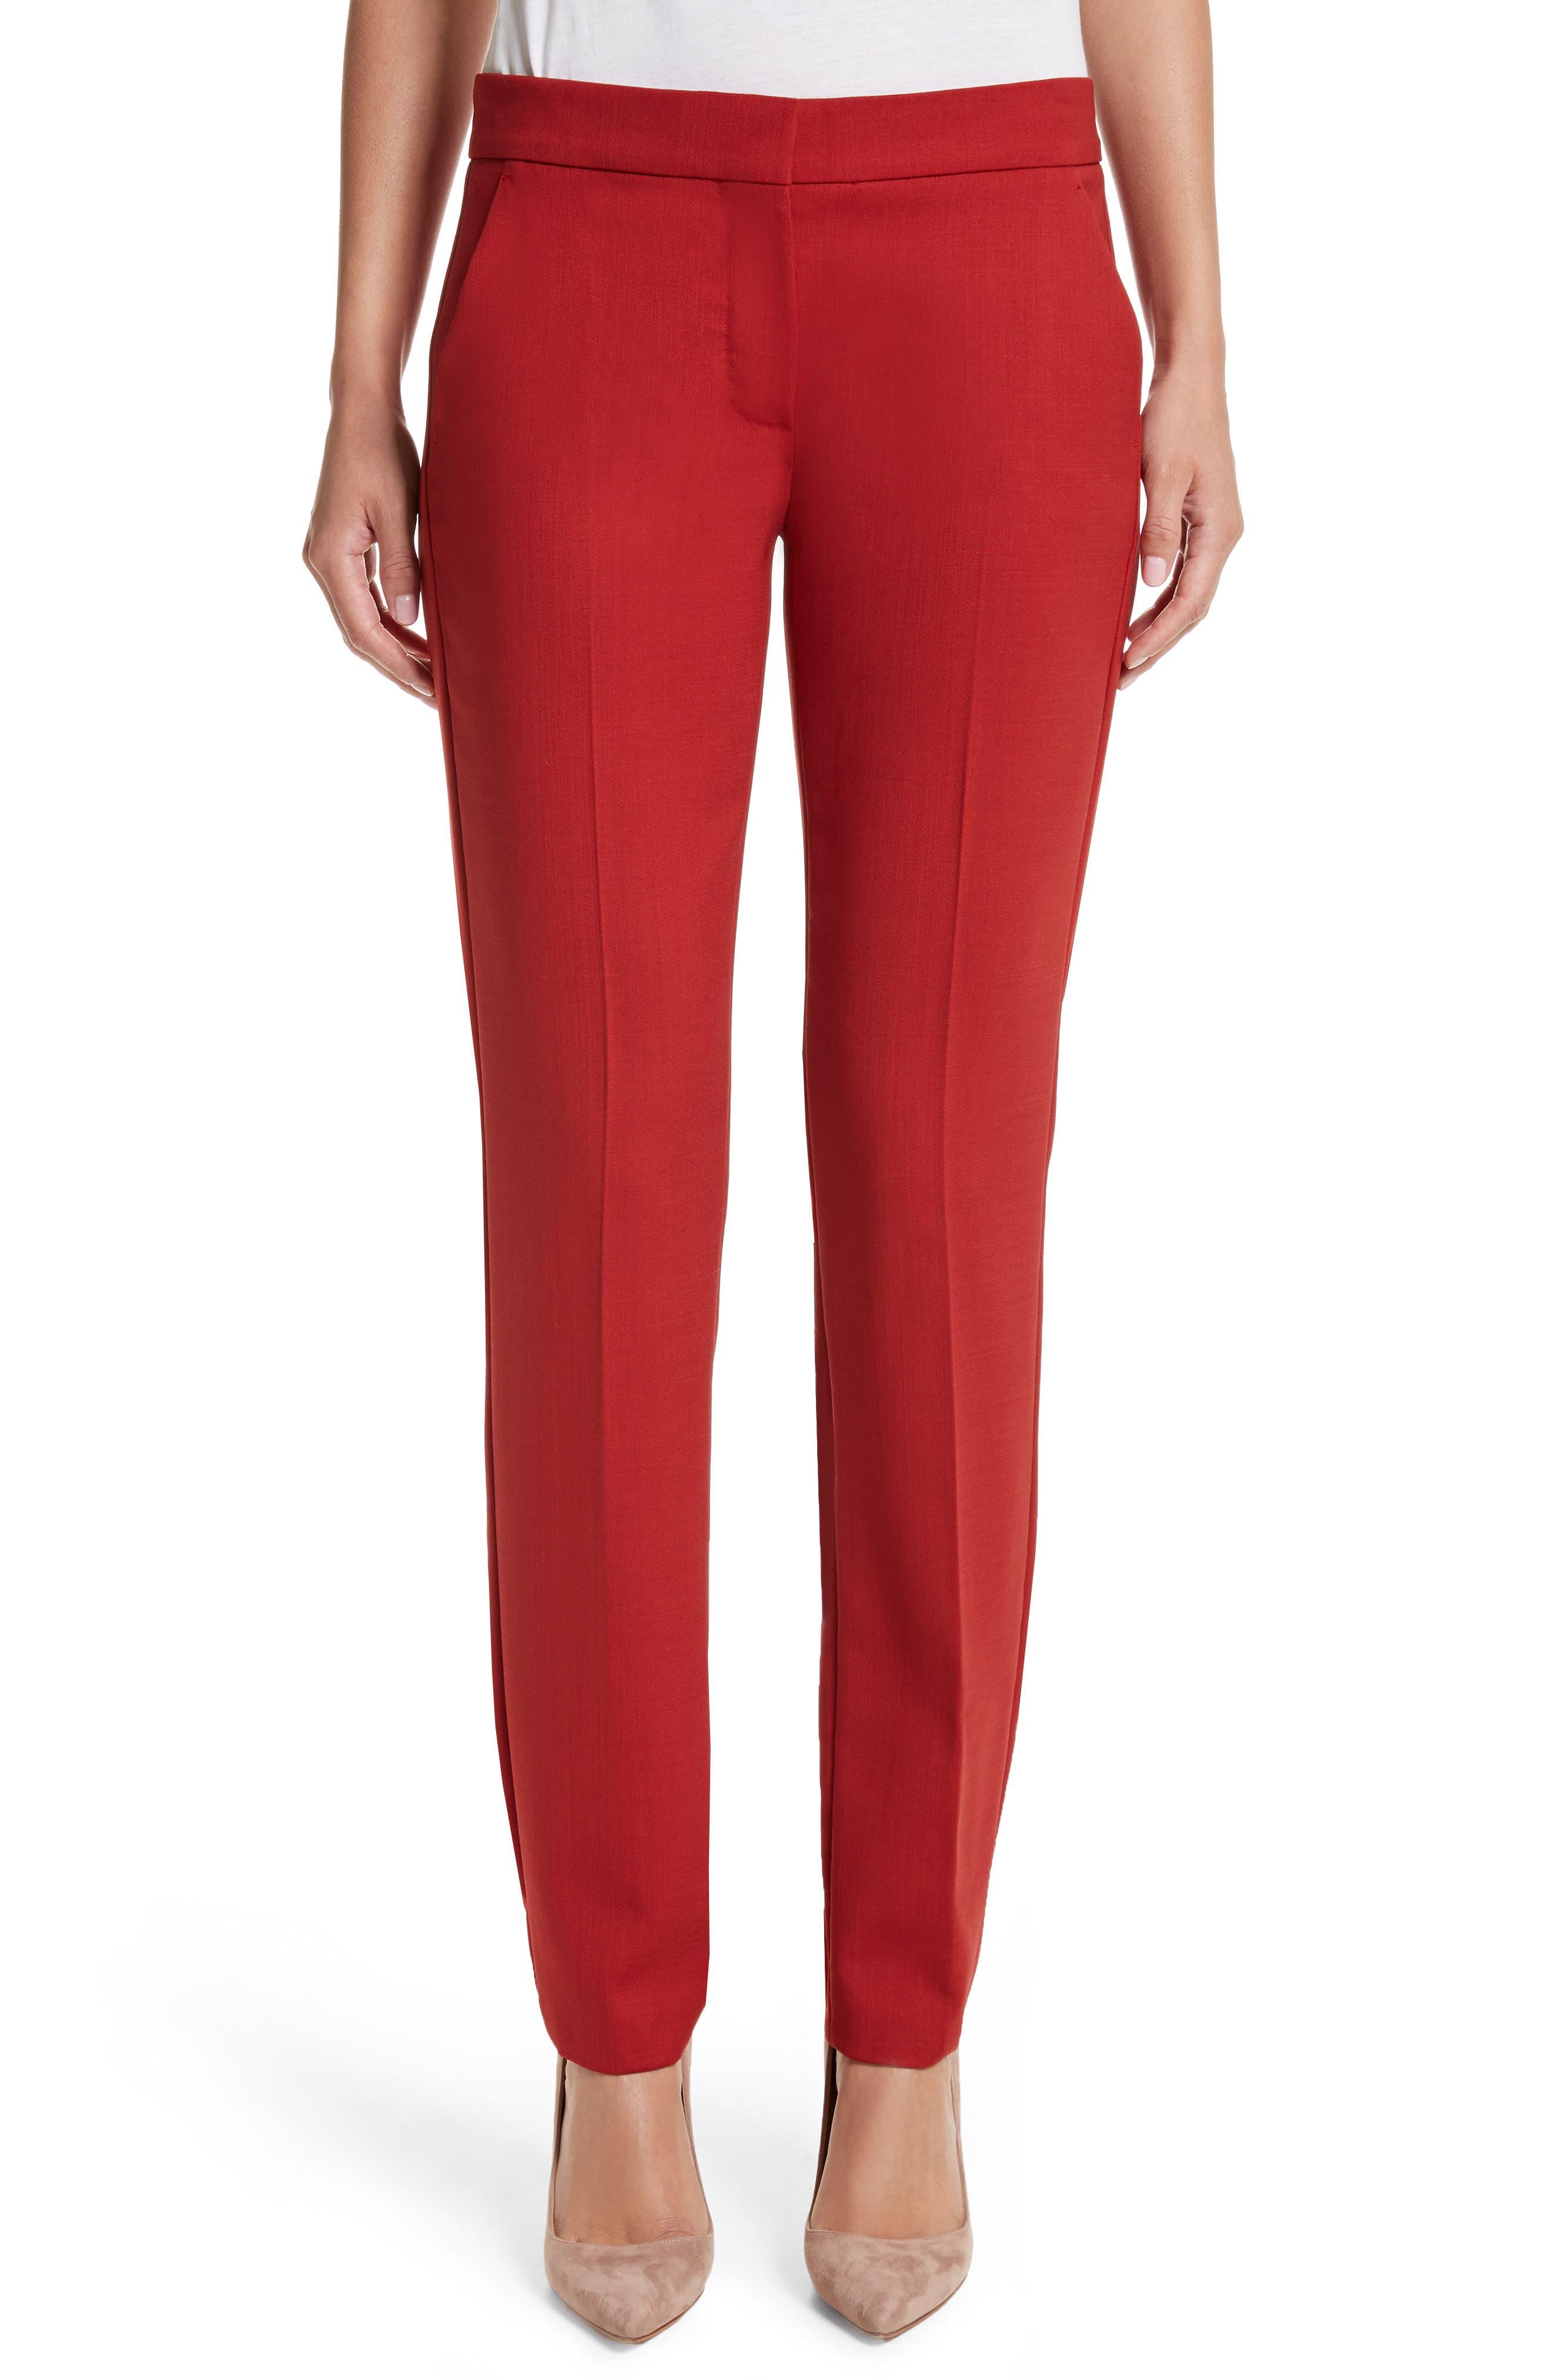 MAX MARA Oscuro Stretch Wool Pants, Main, color, 614